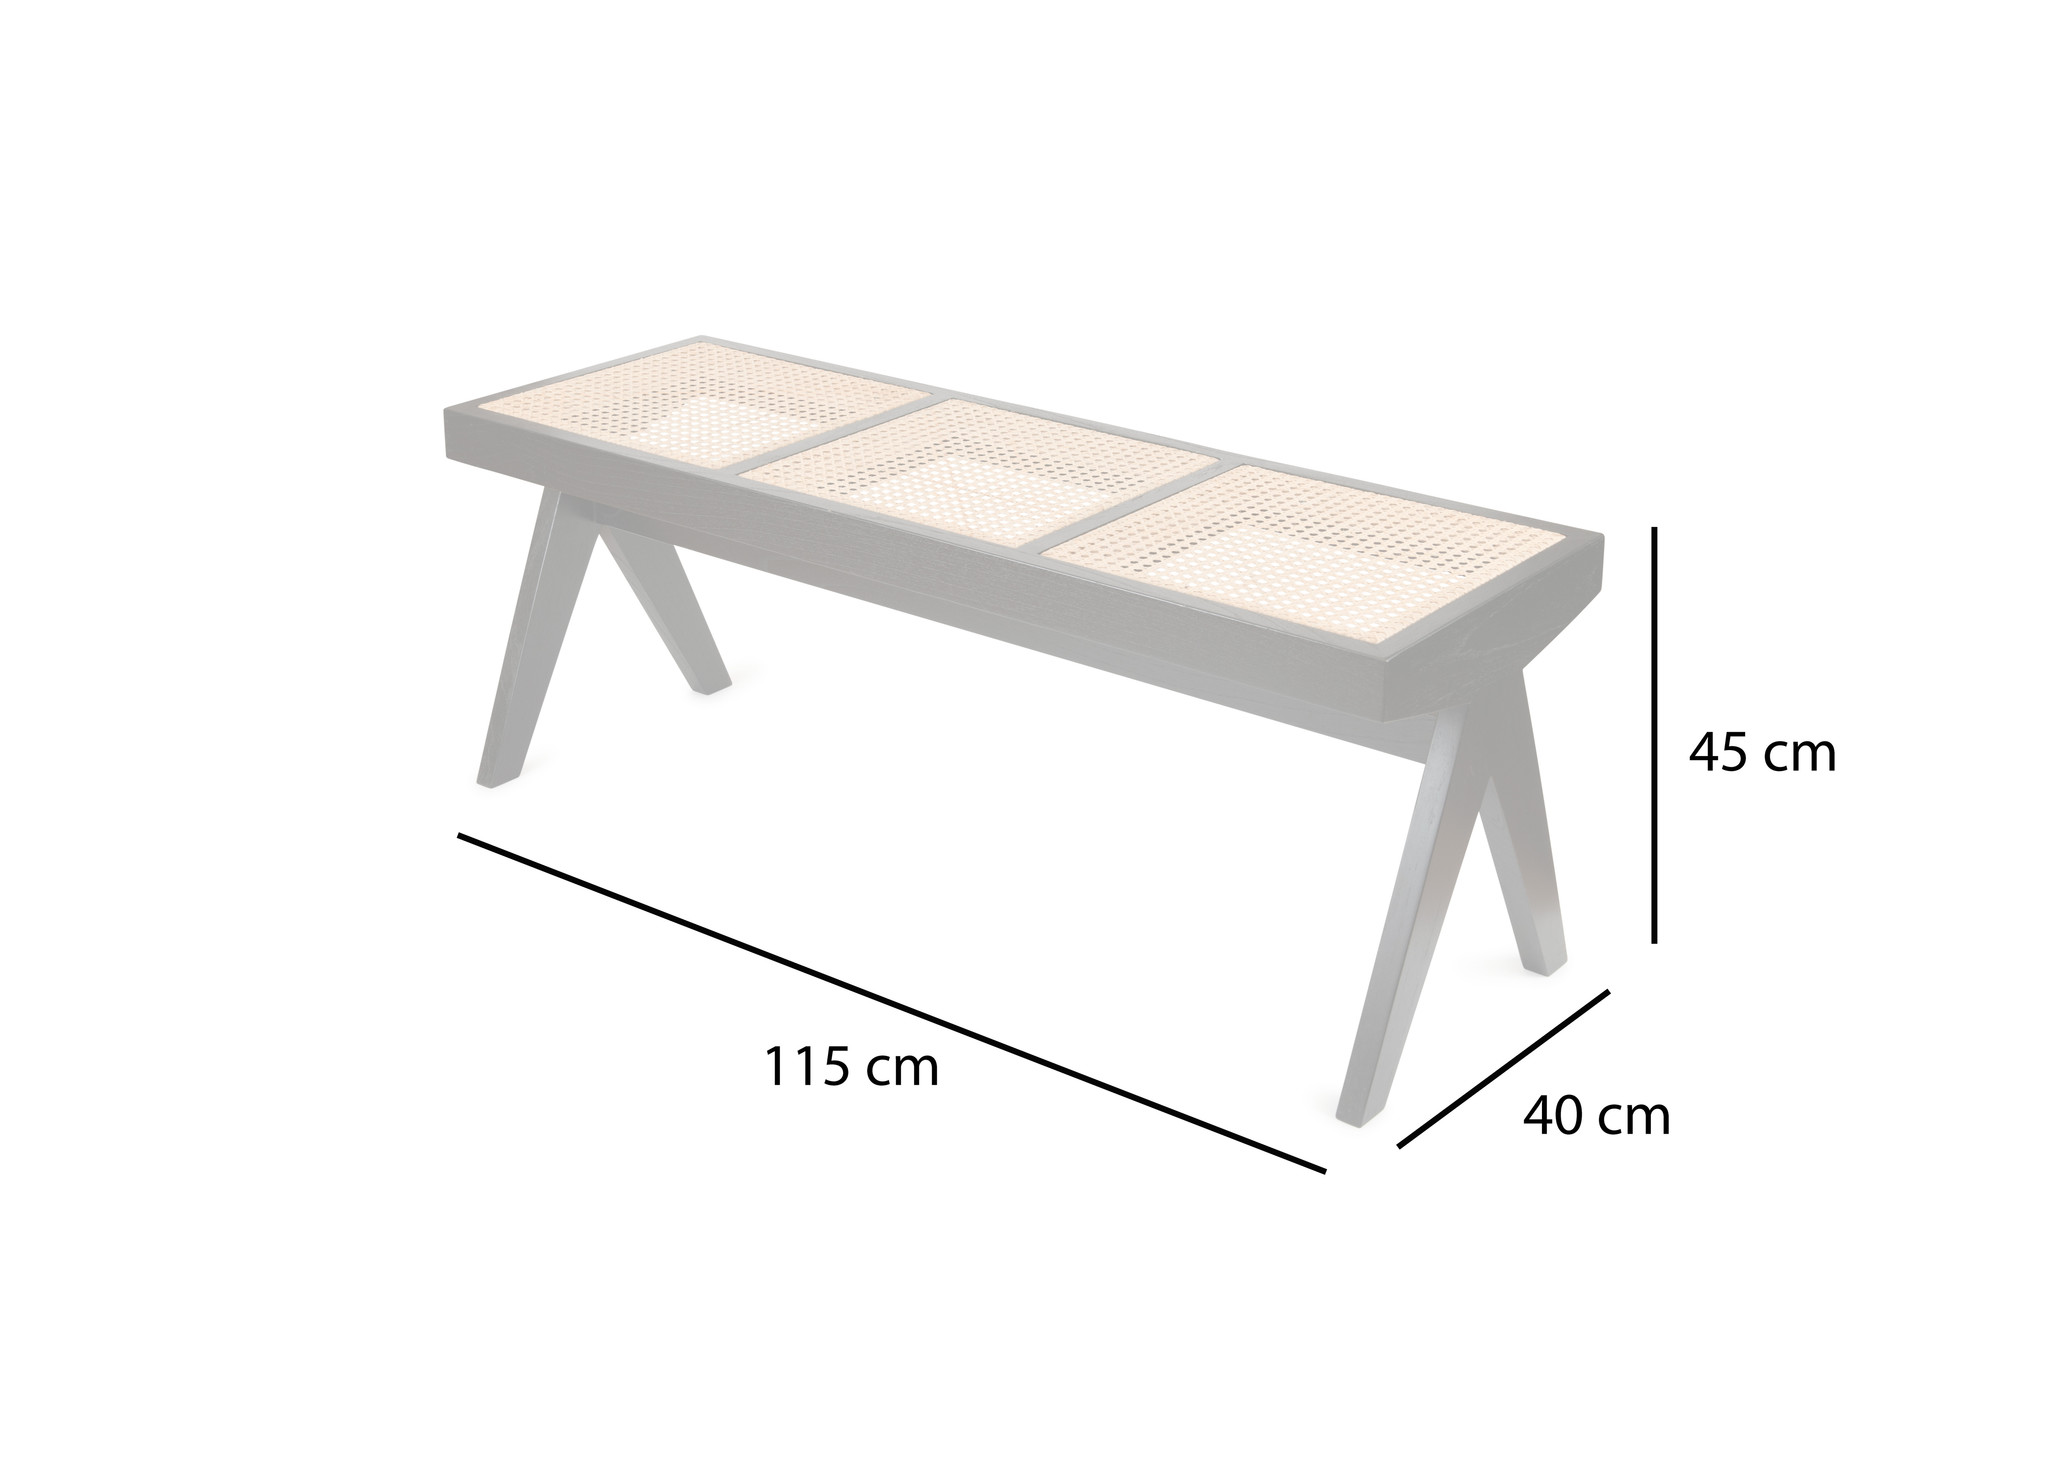 Bench / B.T.H. Flats 3 - Darkened Teak-5